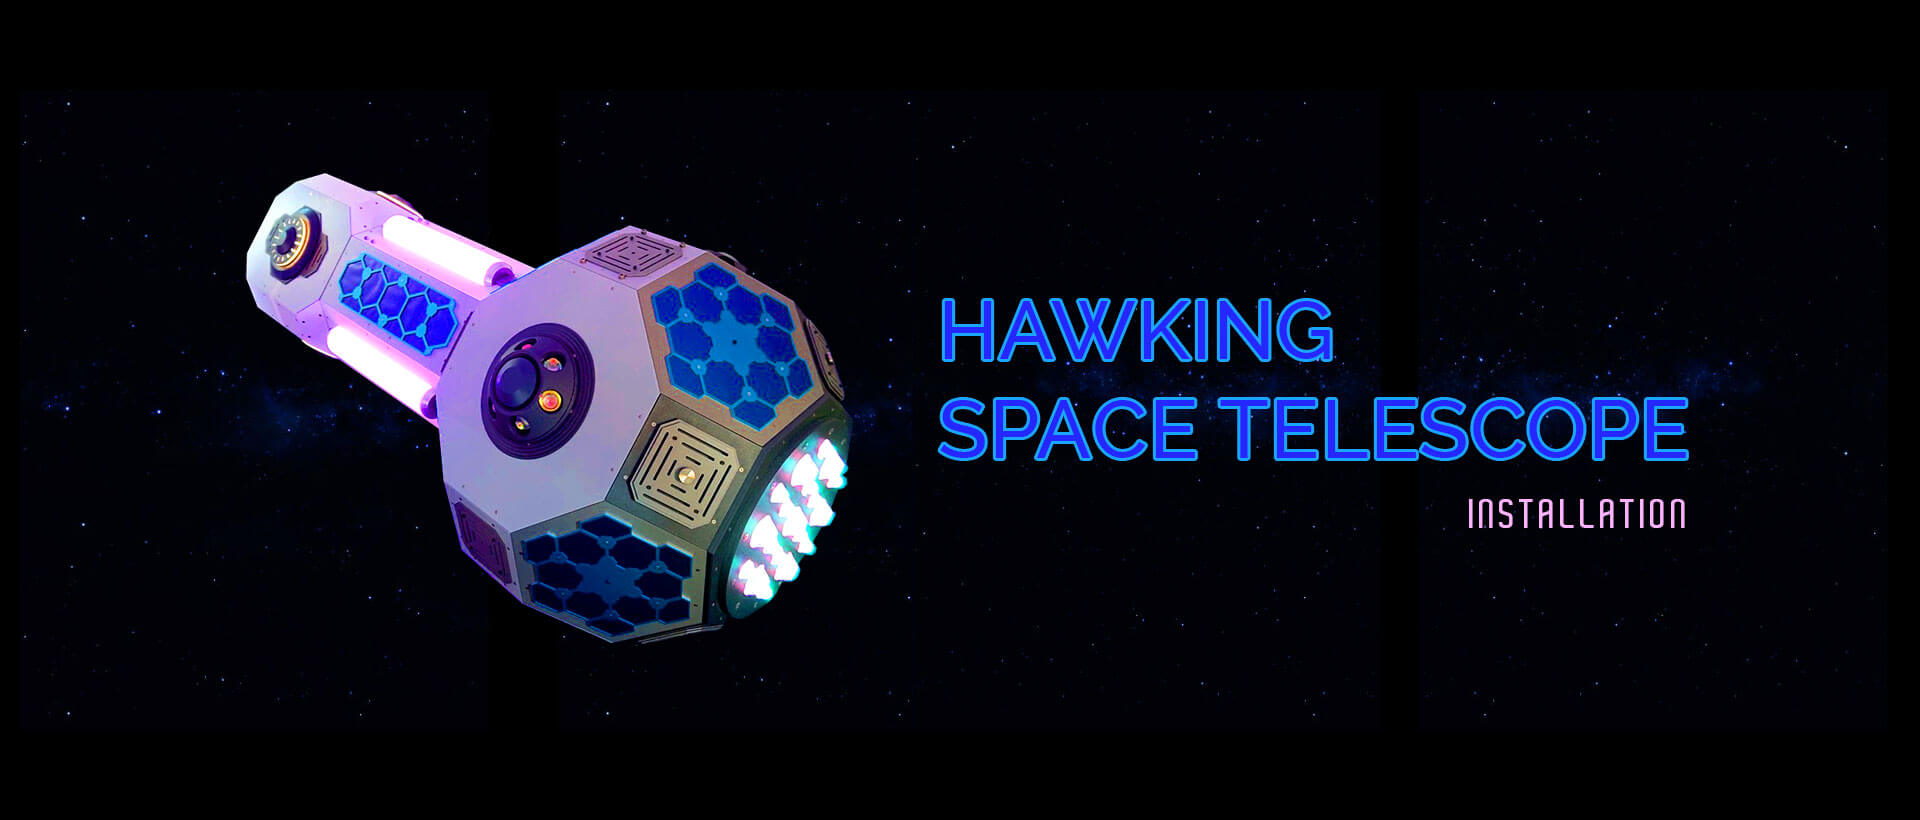 Hawking Space Telescope